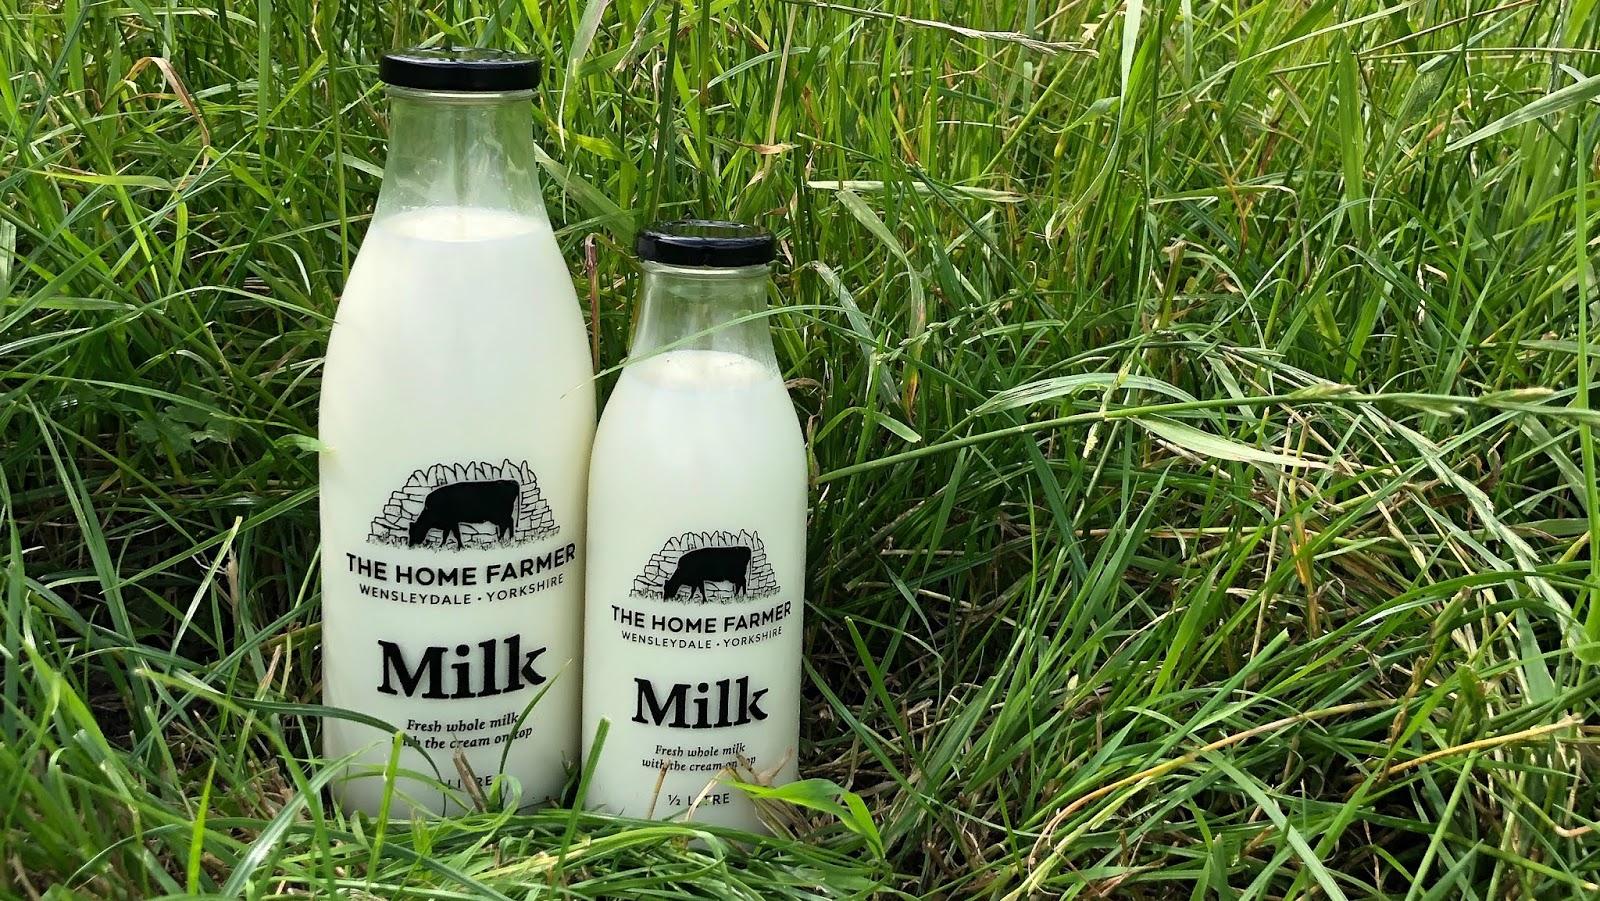 Home Farmer milk